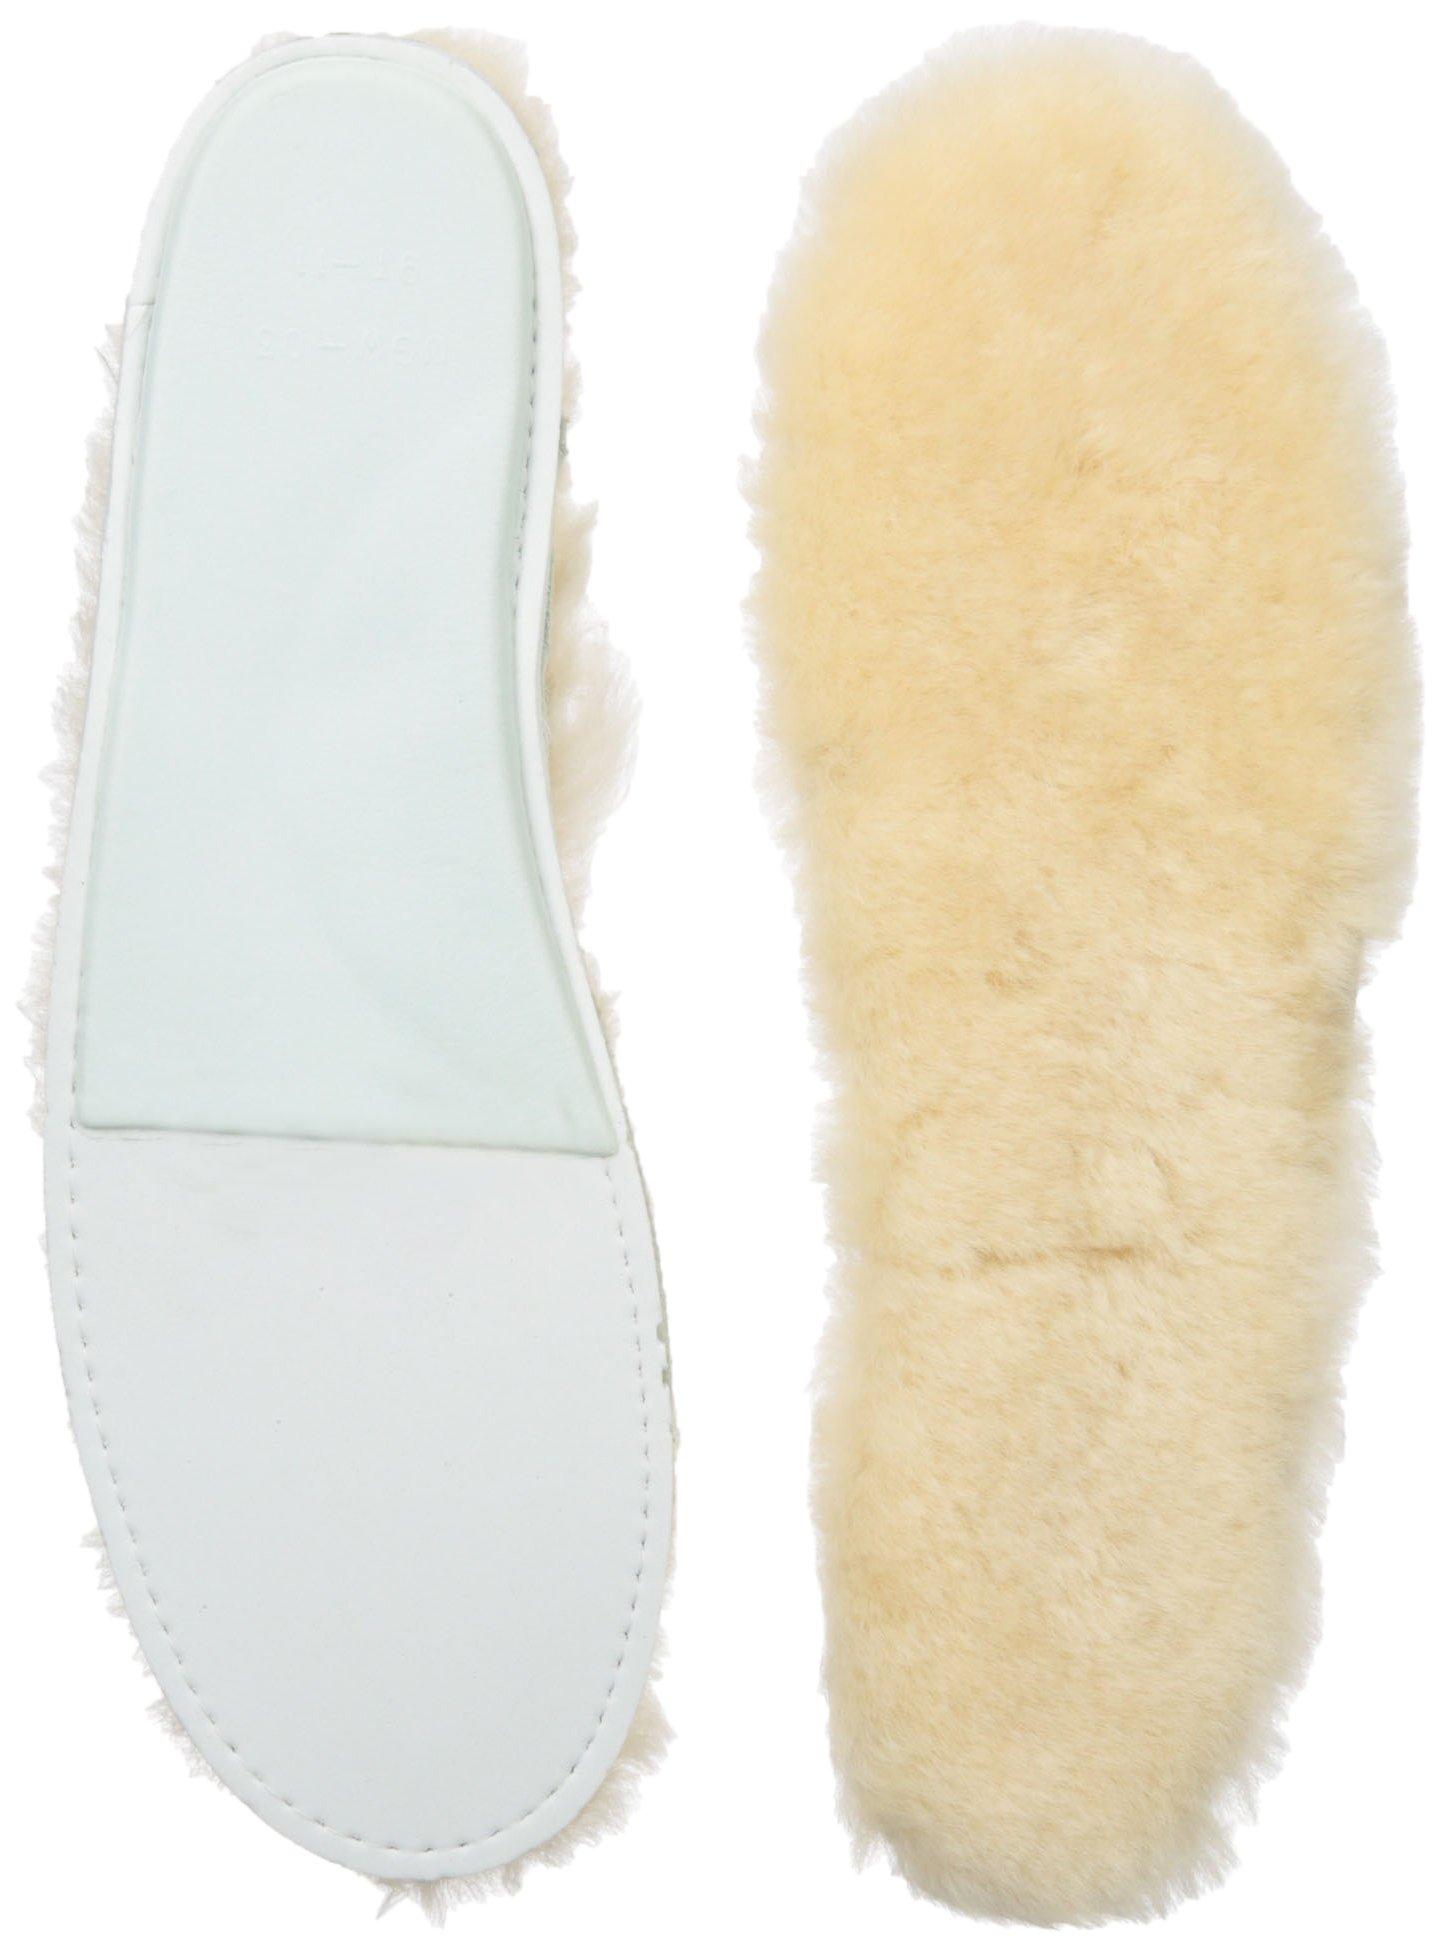 UGG Accessories Women's Women's Sheepskin Insole Shoe Accessory, White, 9 Medium US